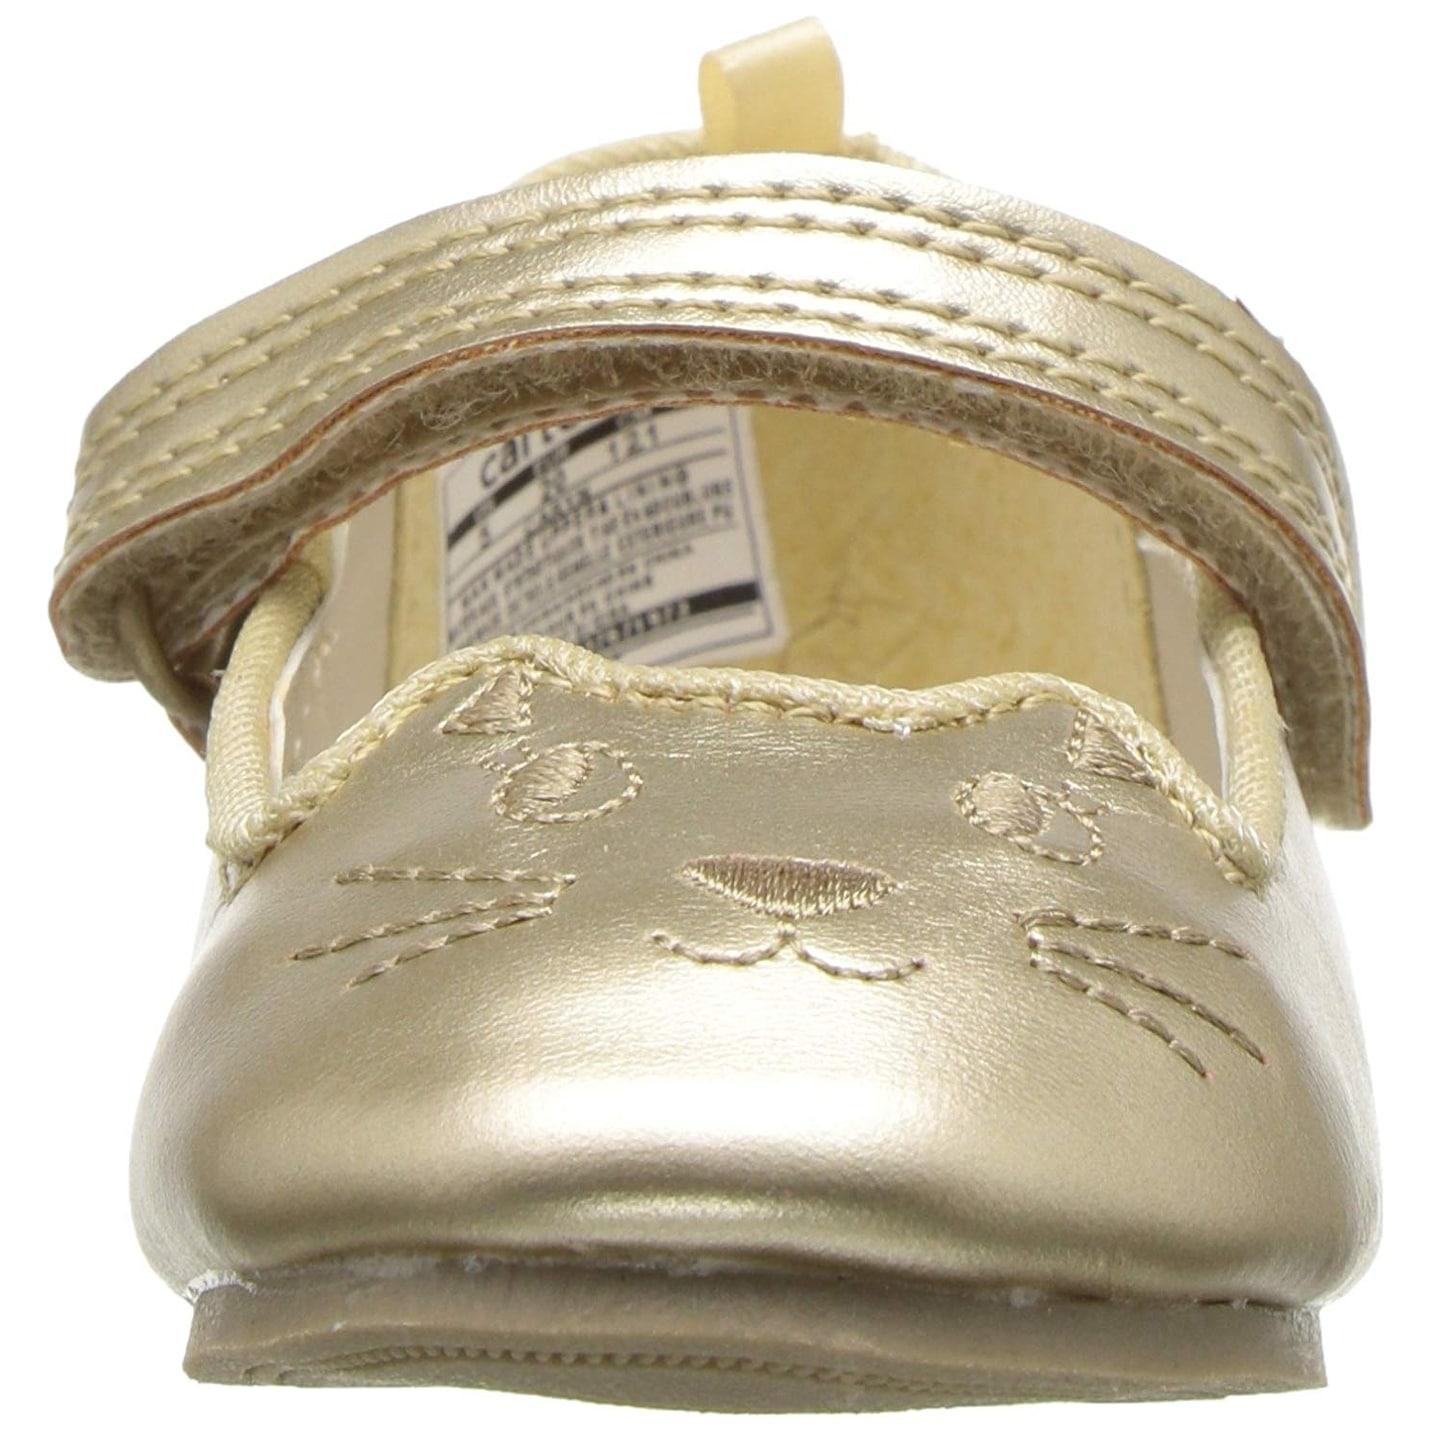 227becfad Shop Carter's Kids Caryn Girl's Kitten Flat Ballet - On Sale - Free  Shipping On Orders Over $45 - Overstock - 25442719